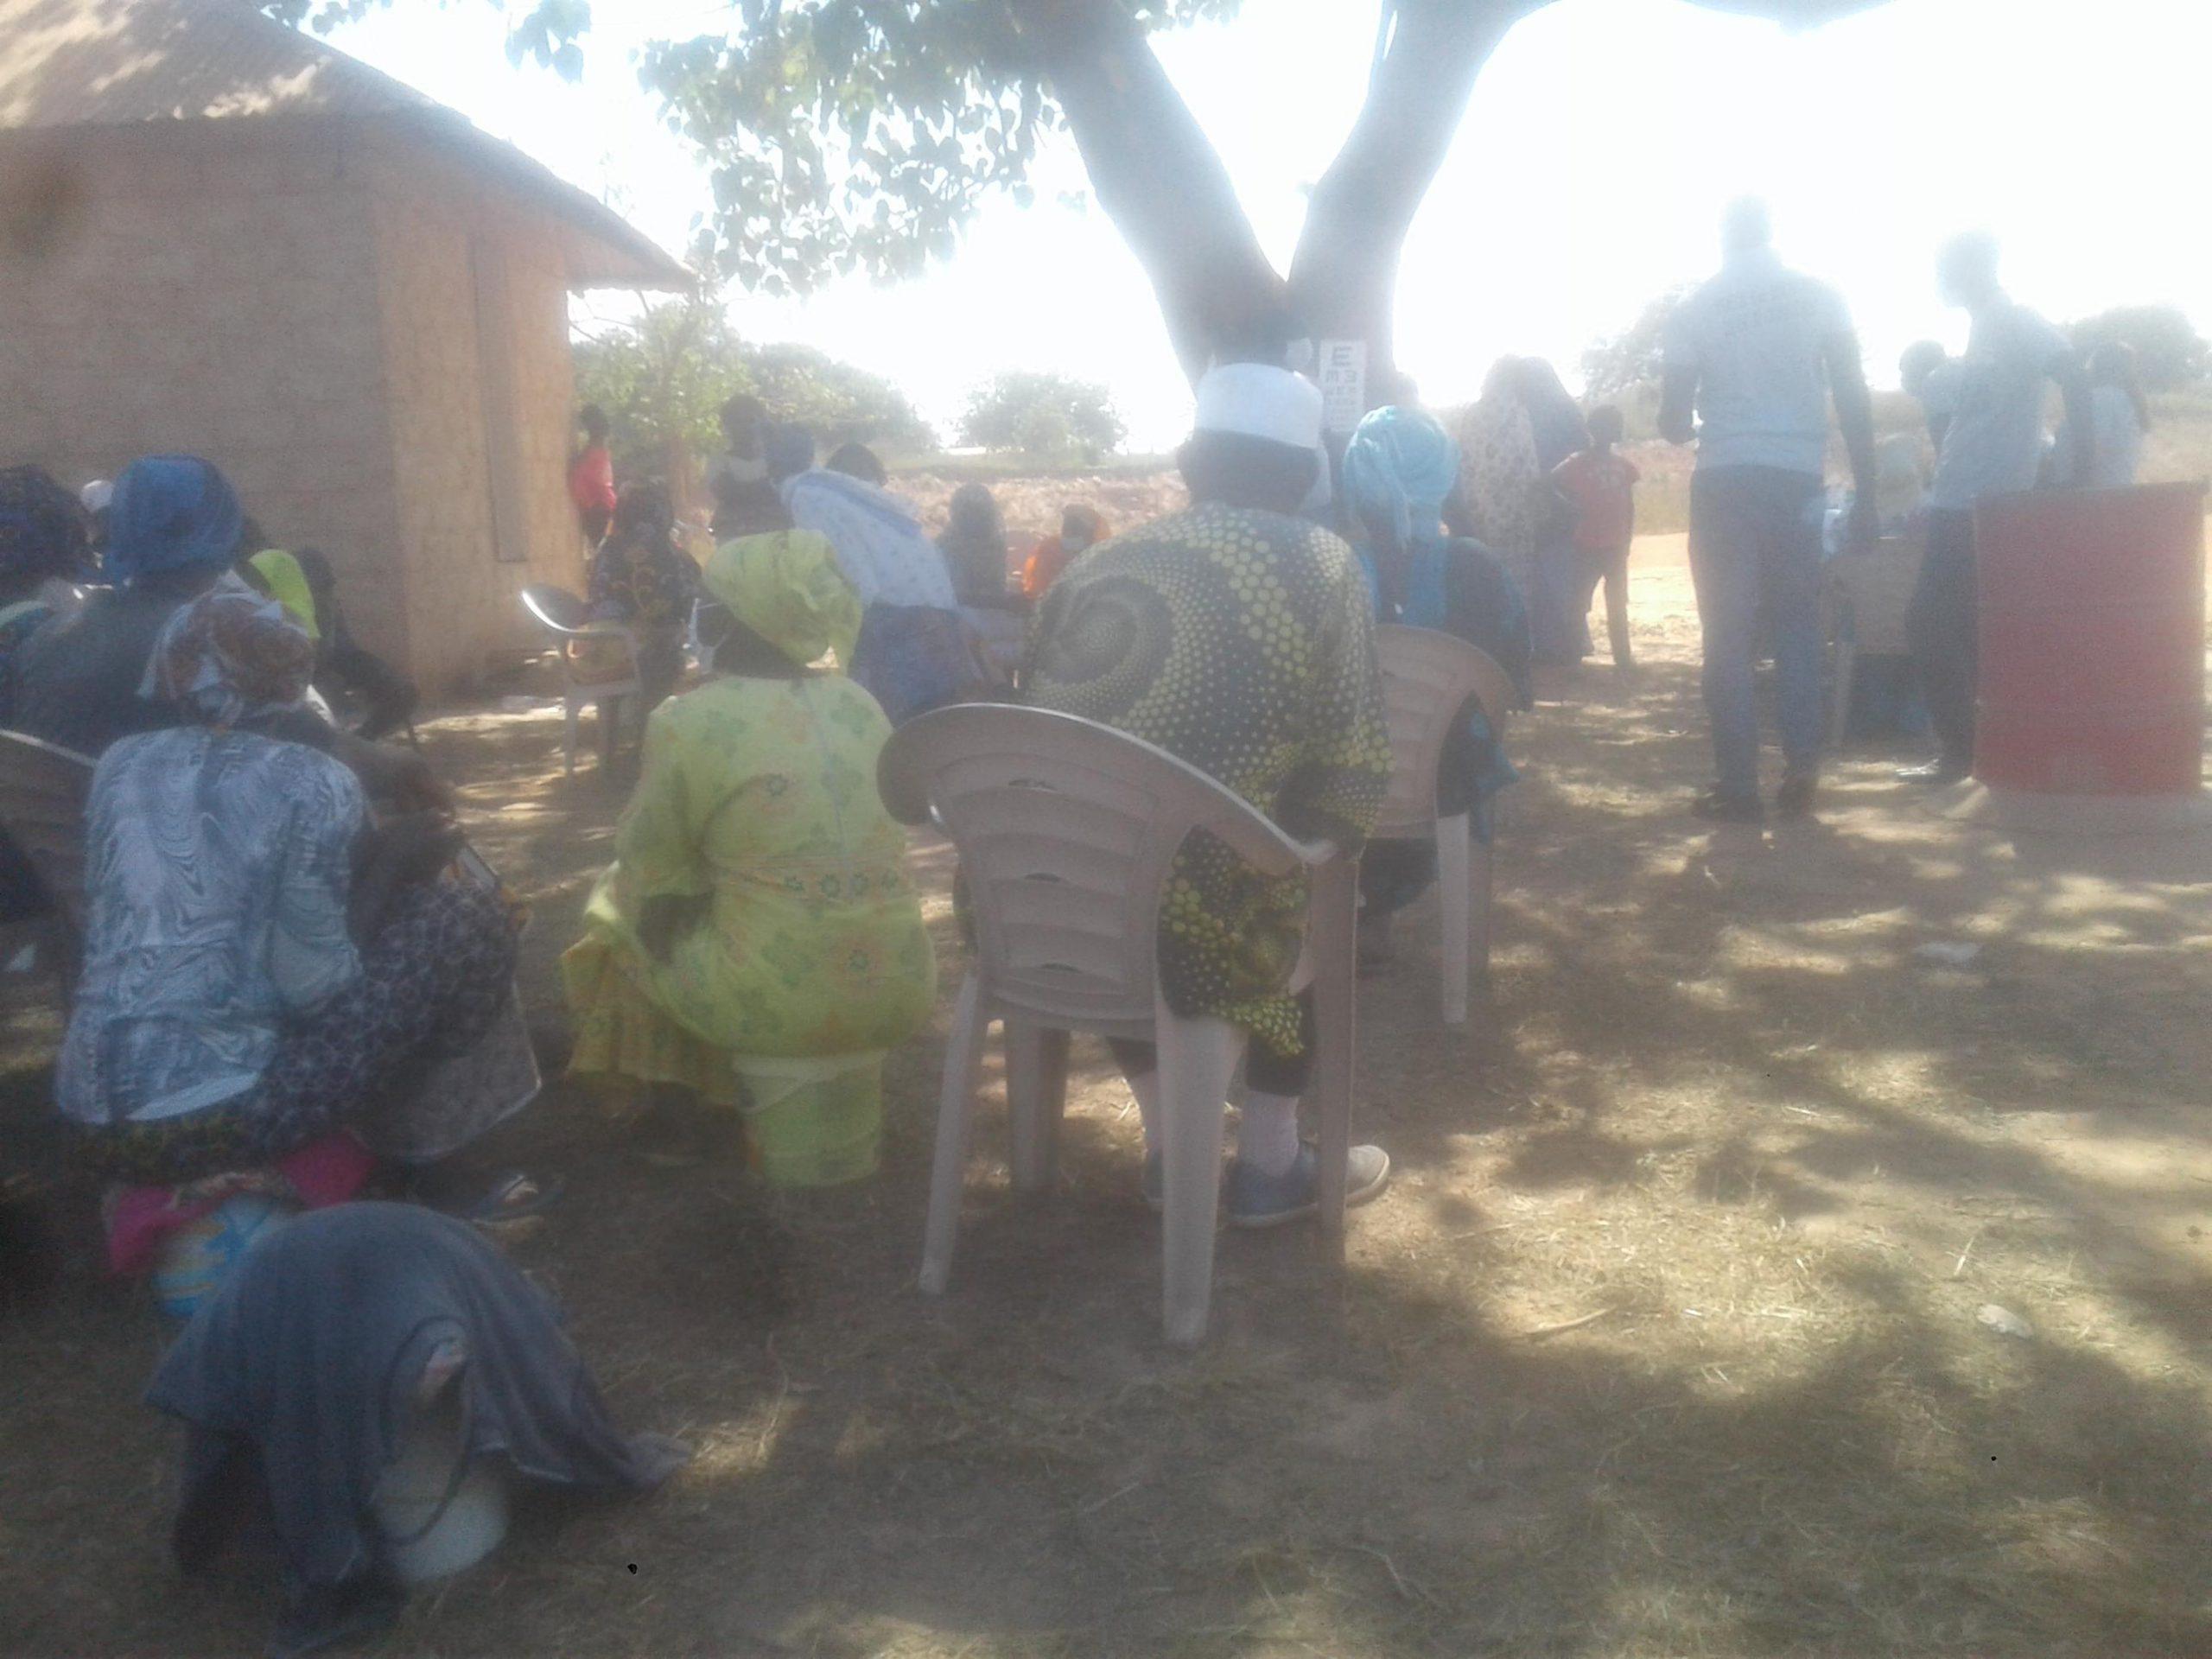 89 Women miners receive free eye screening from Gui mam eye care